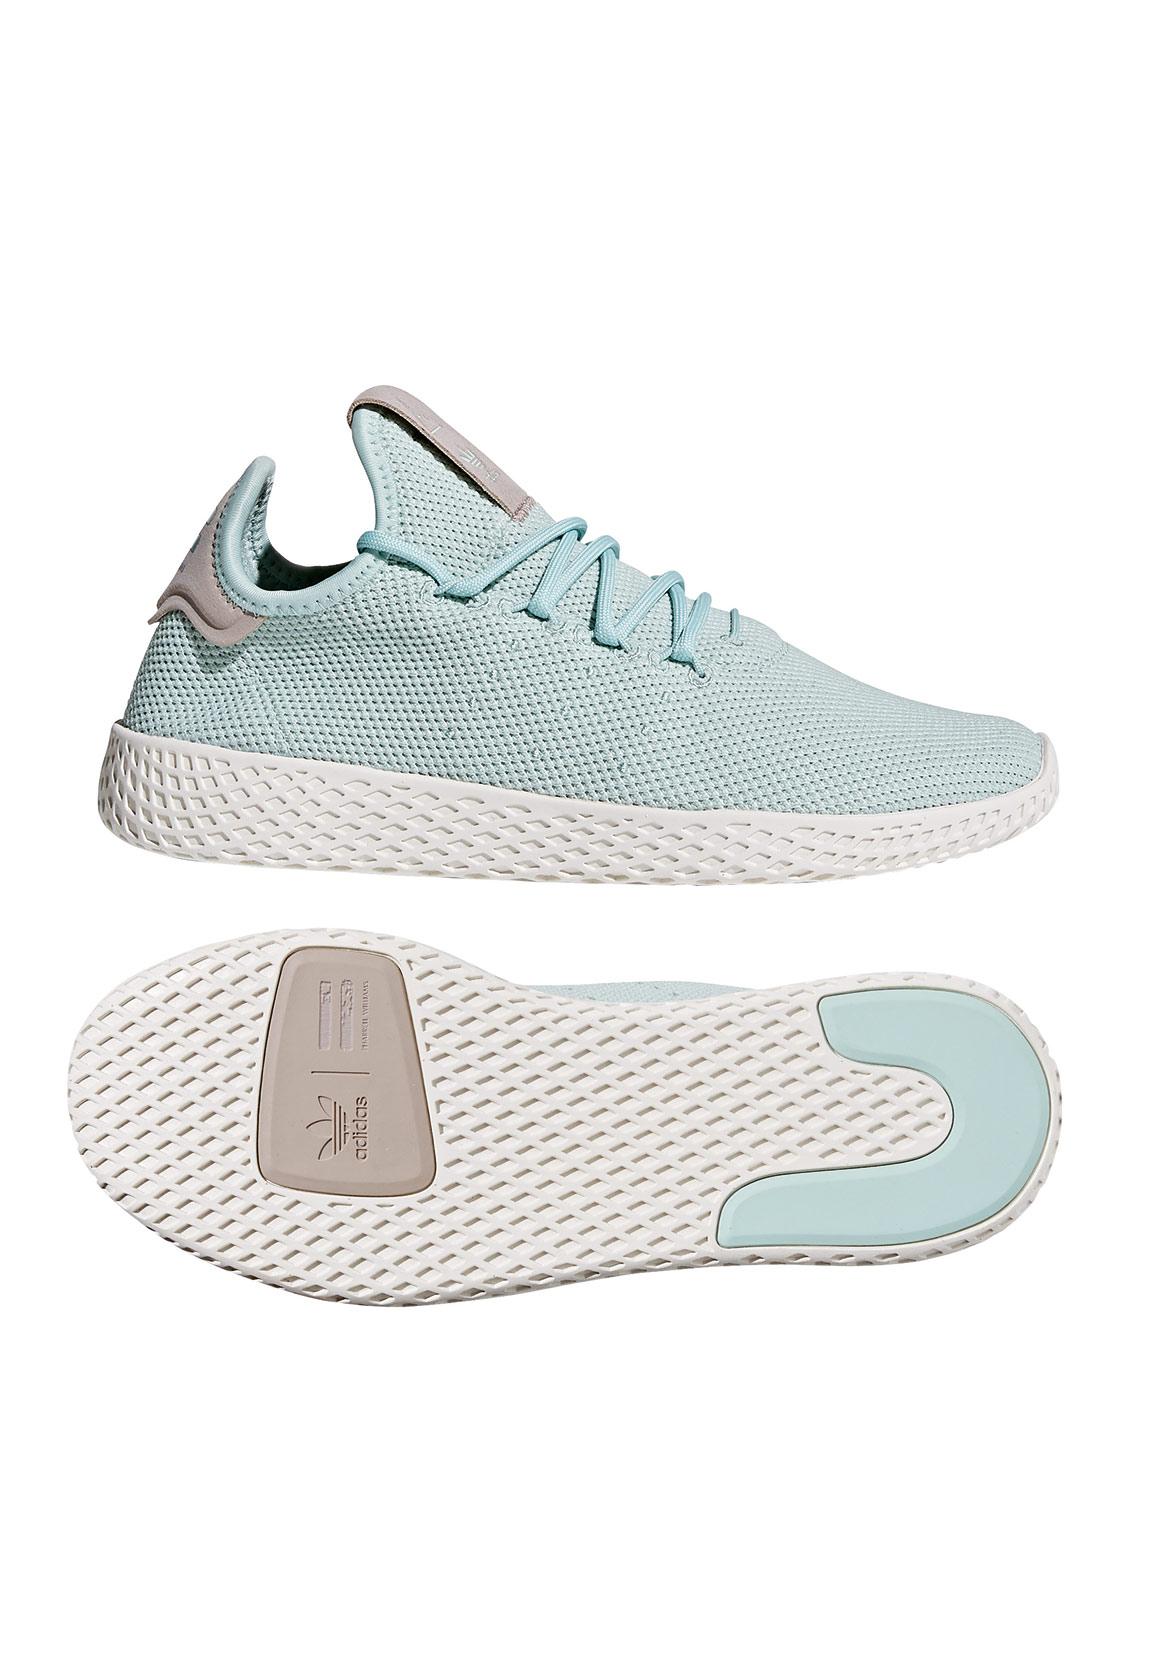 on sale ff4a6 25d5d Fabricant Adidas Originals